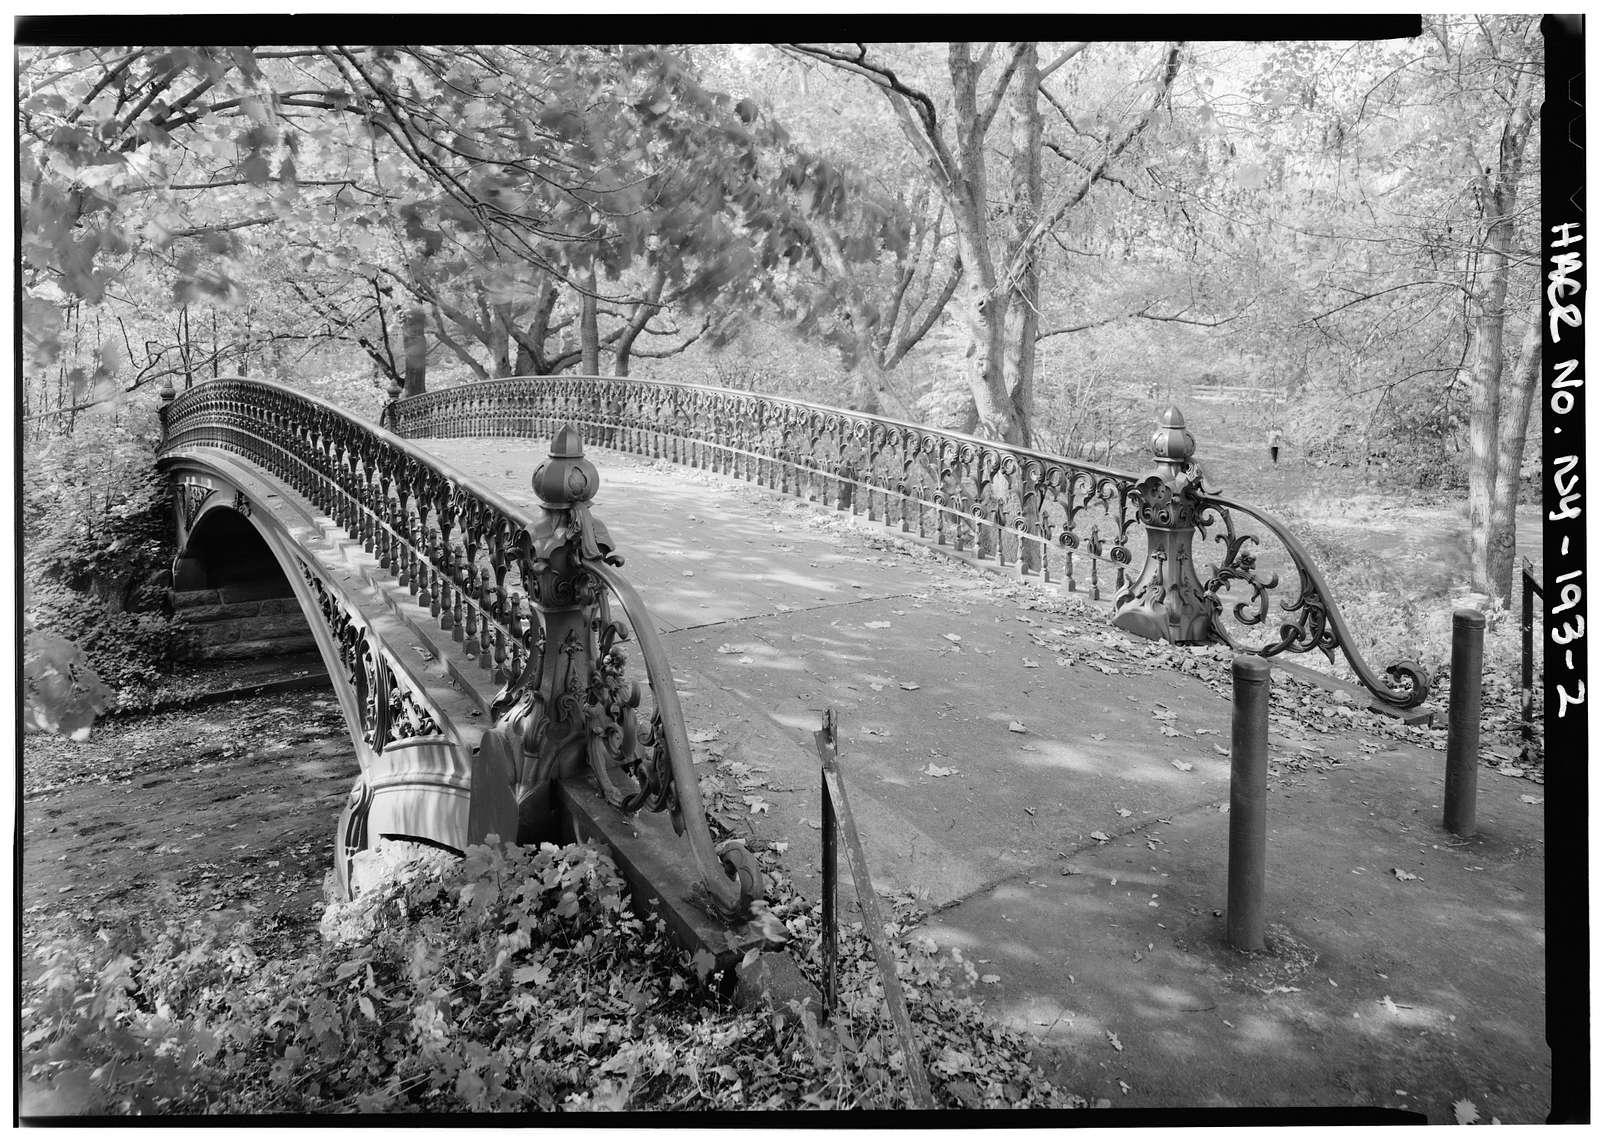 Central Park Bridges, Bridge No. 27, Central Park, Southwest of Reservoir, New York, New York County, NY